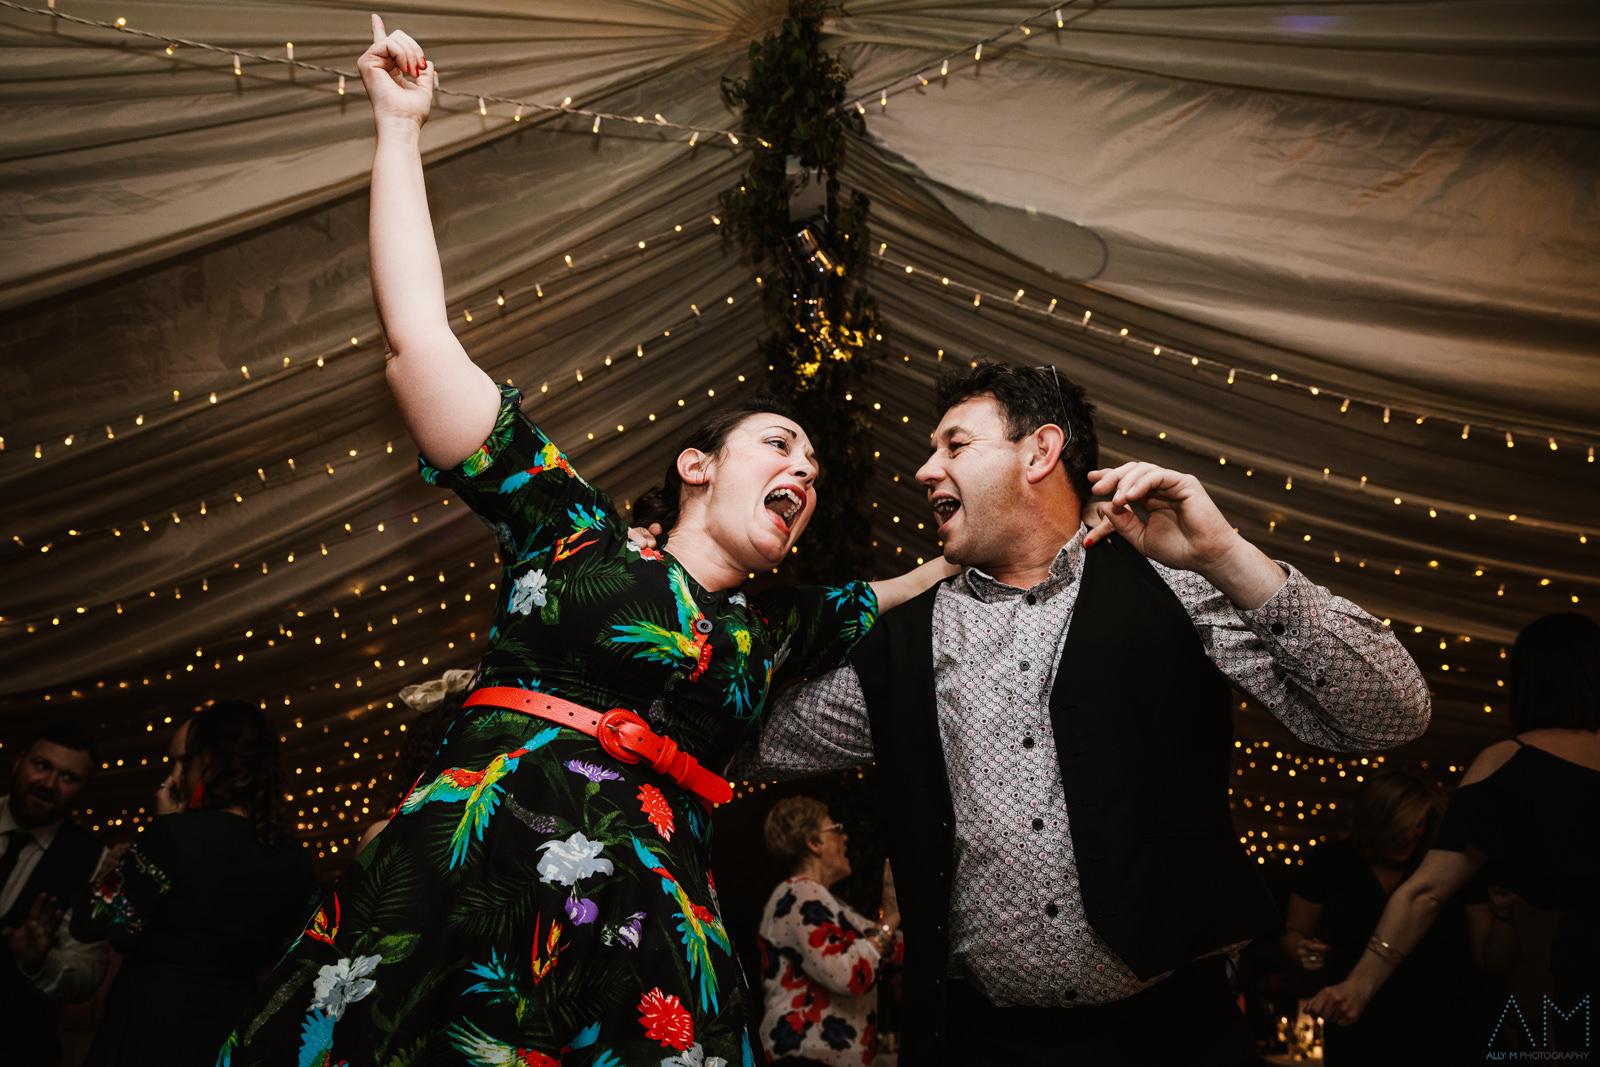 Gay and woman singing